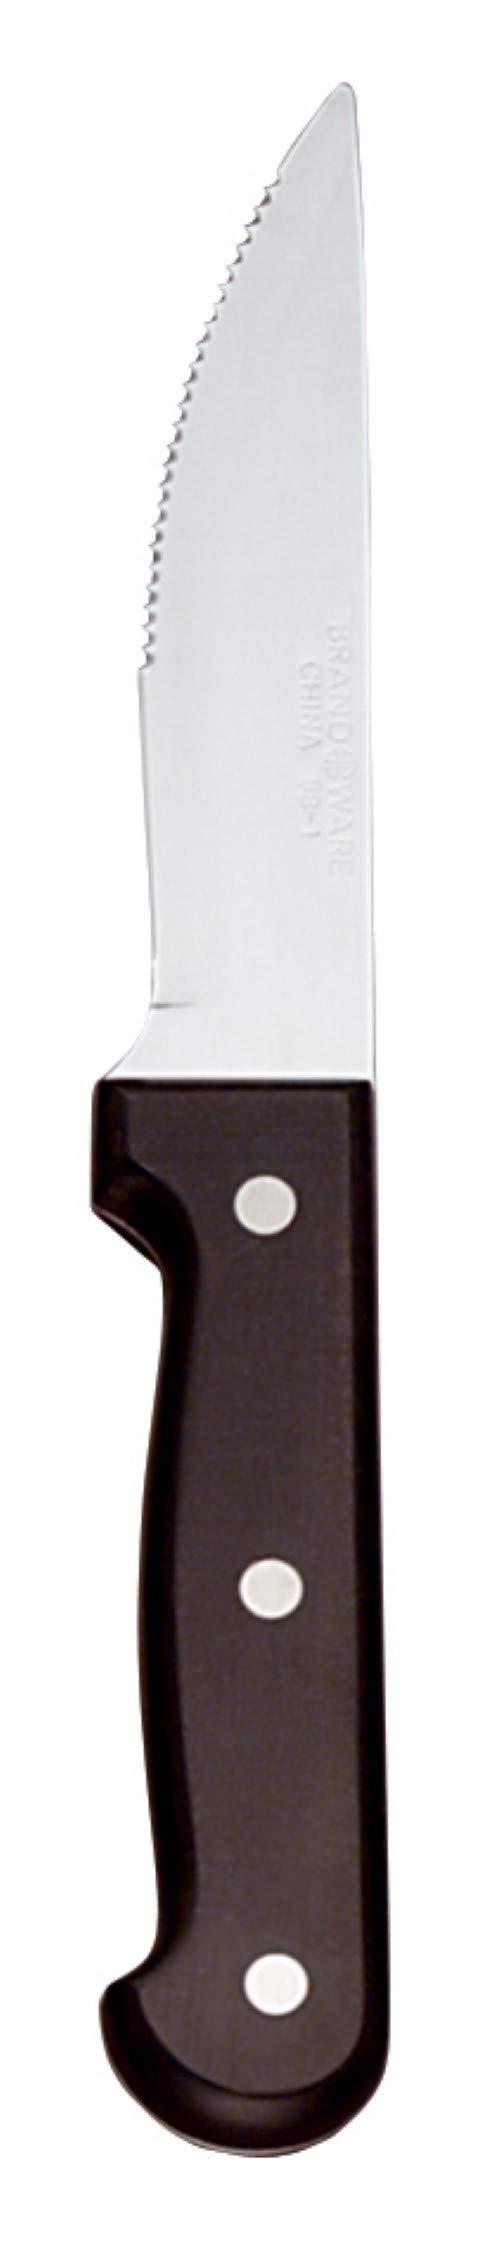 World Tableware Chop House Steak Knife, 8 3/4 inch - 12 per case by World Tableware